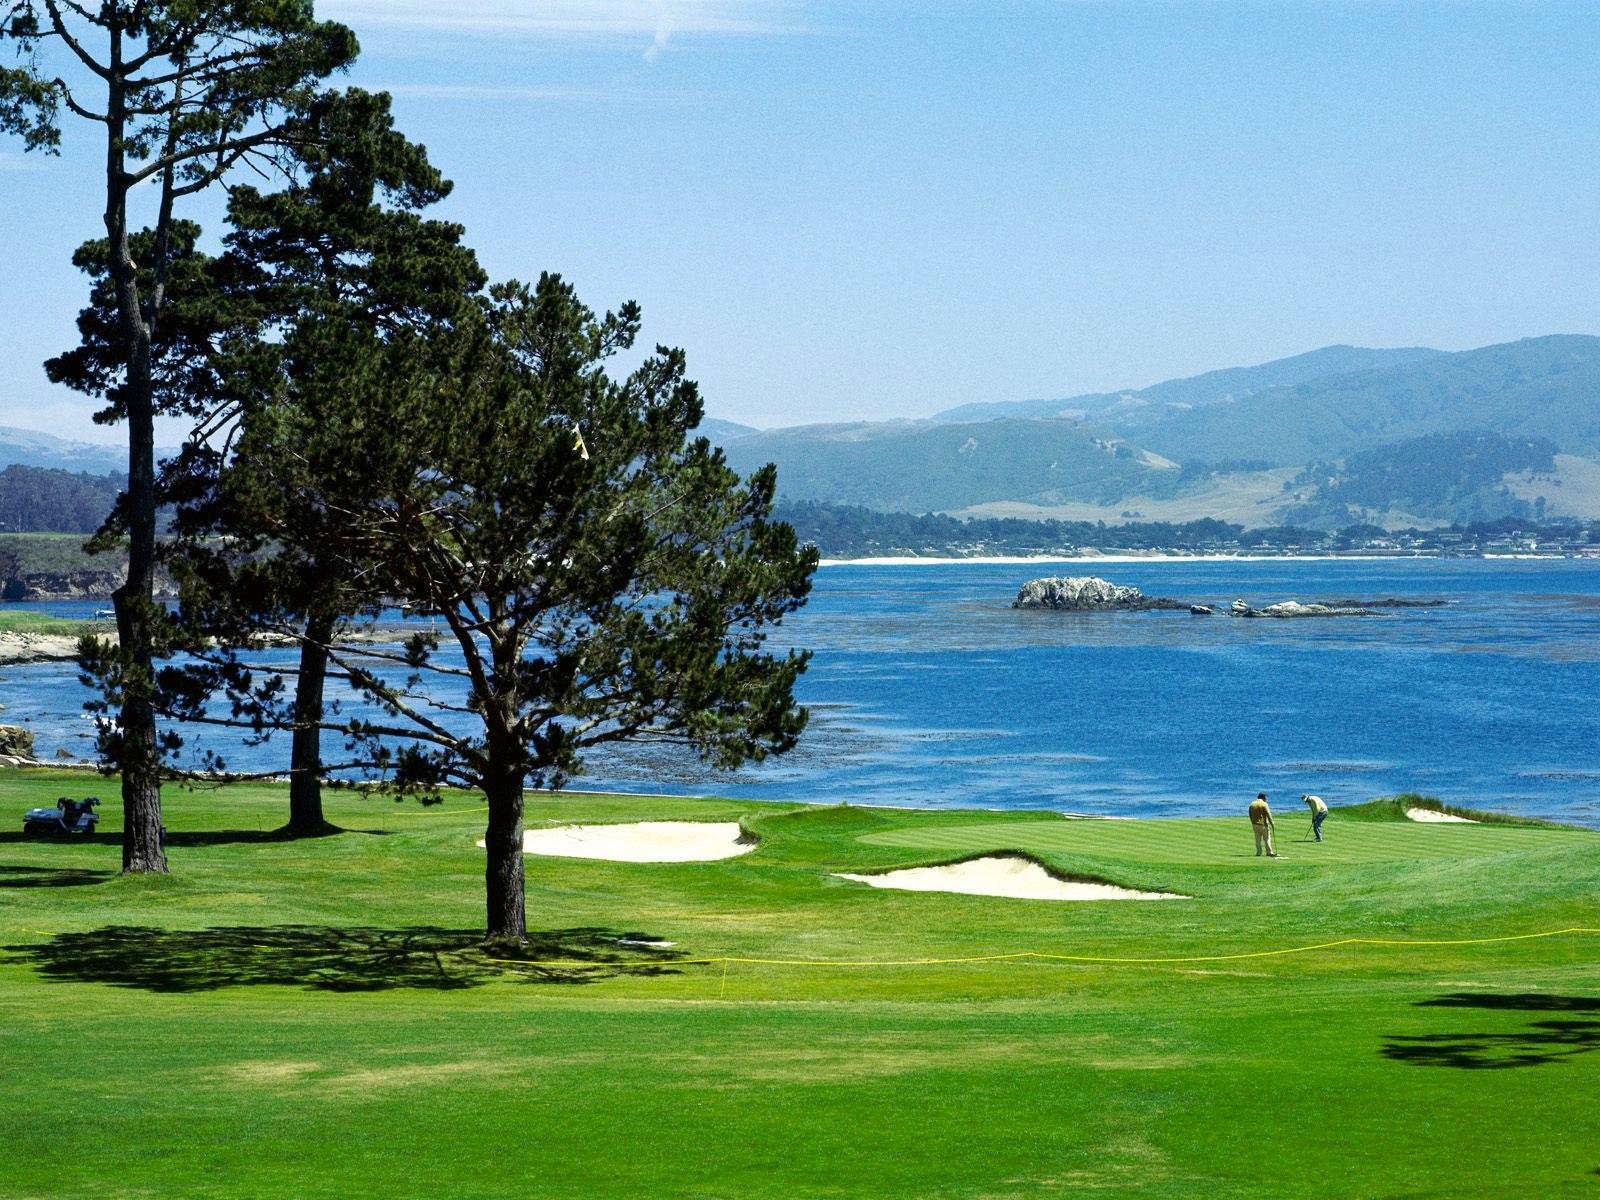 Golf Charter Yacht Stargazer - Pebble Beach Golf Course